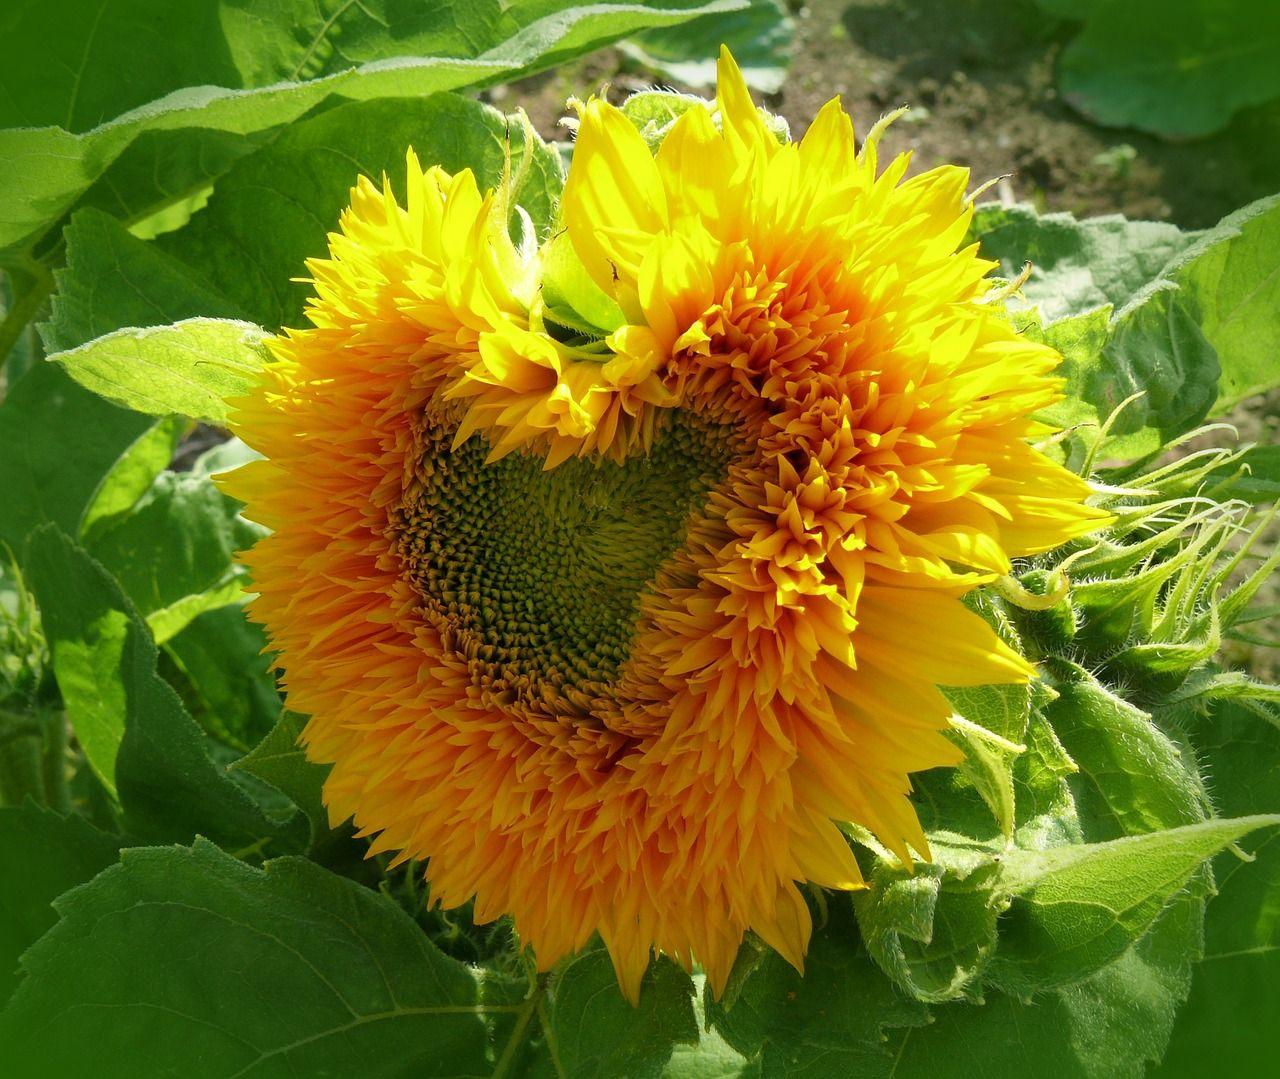 Gratis Obraz Na Pixabay Slonecznik Serce Sloneczny Kwiat Heart Shapes Heart In Nature Sunflower